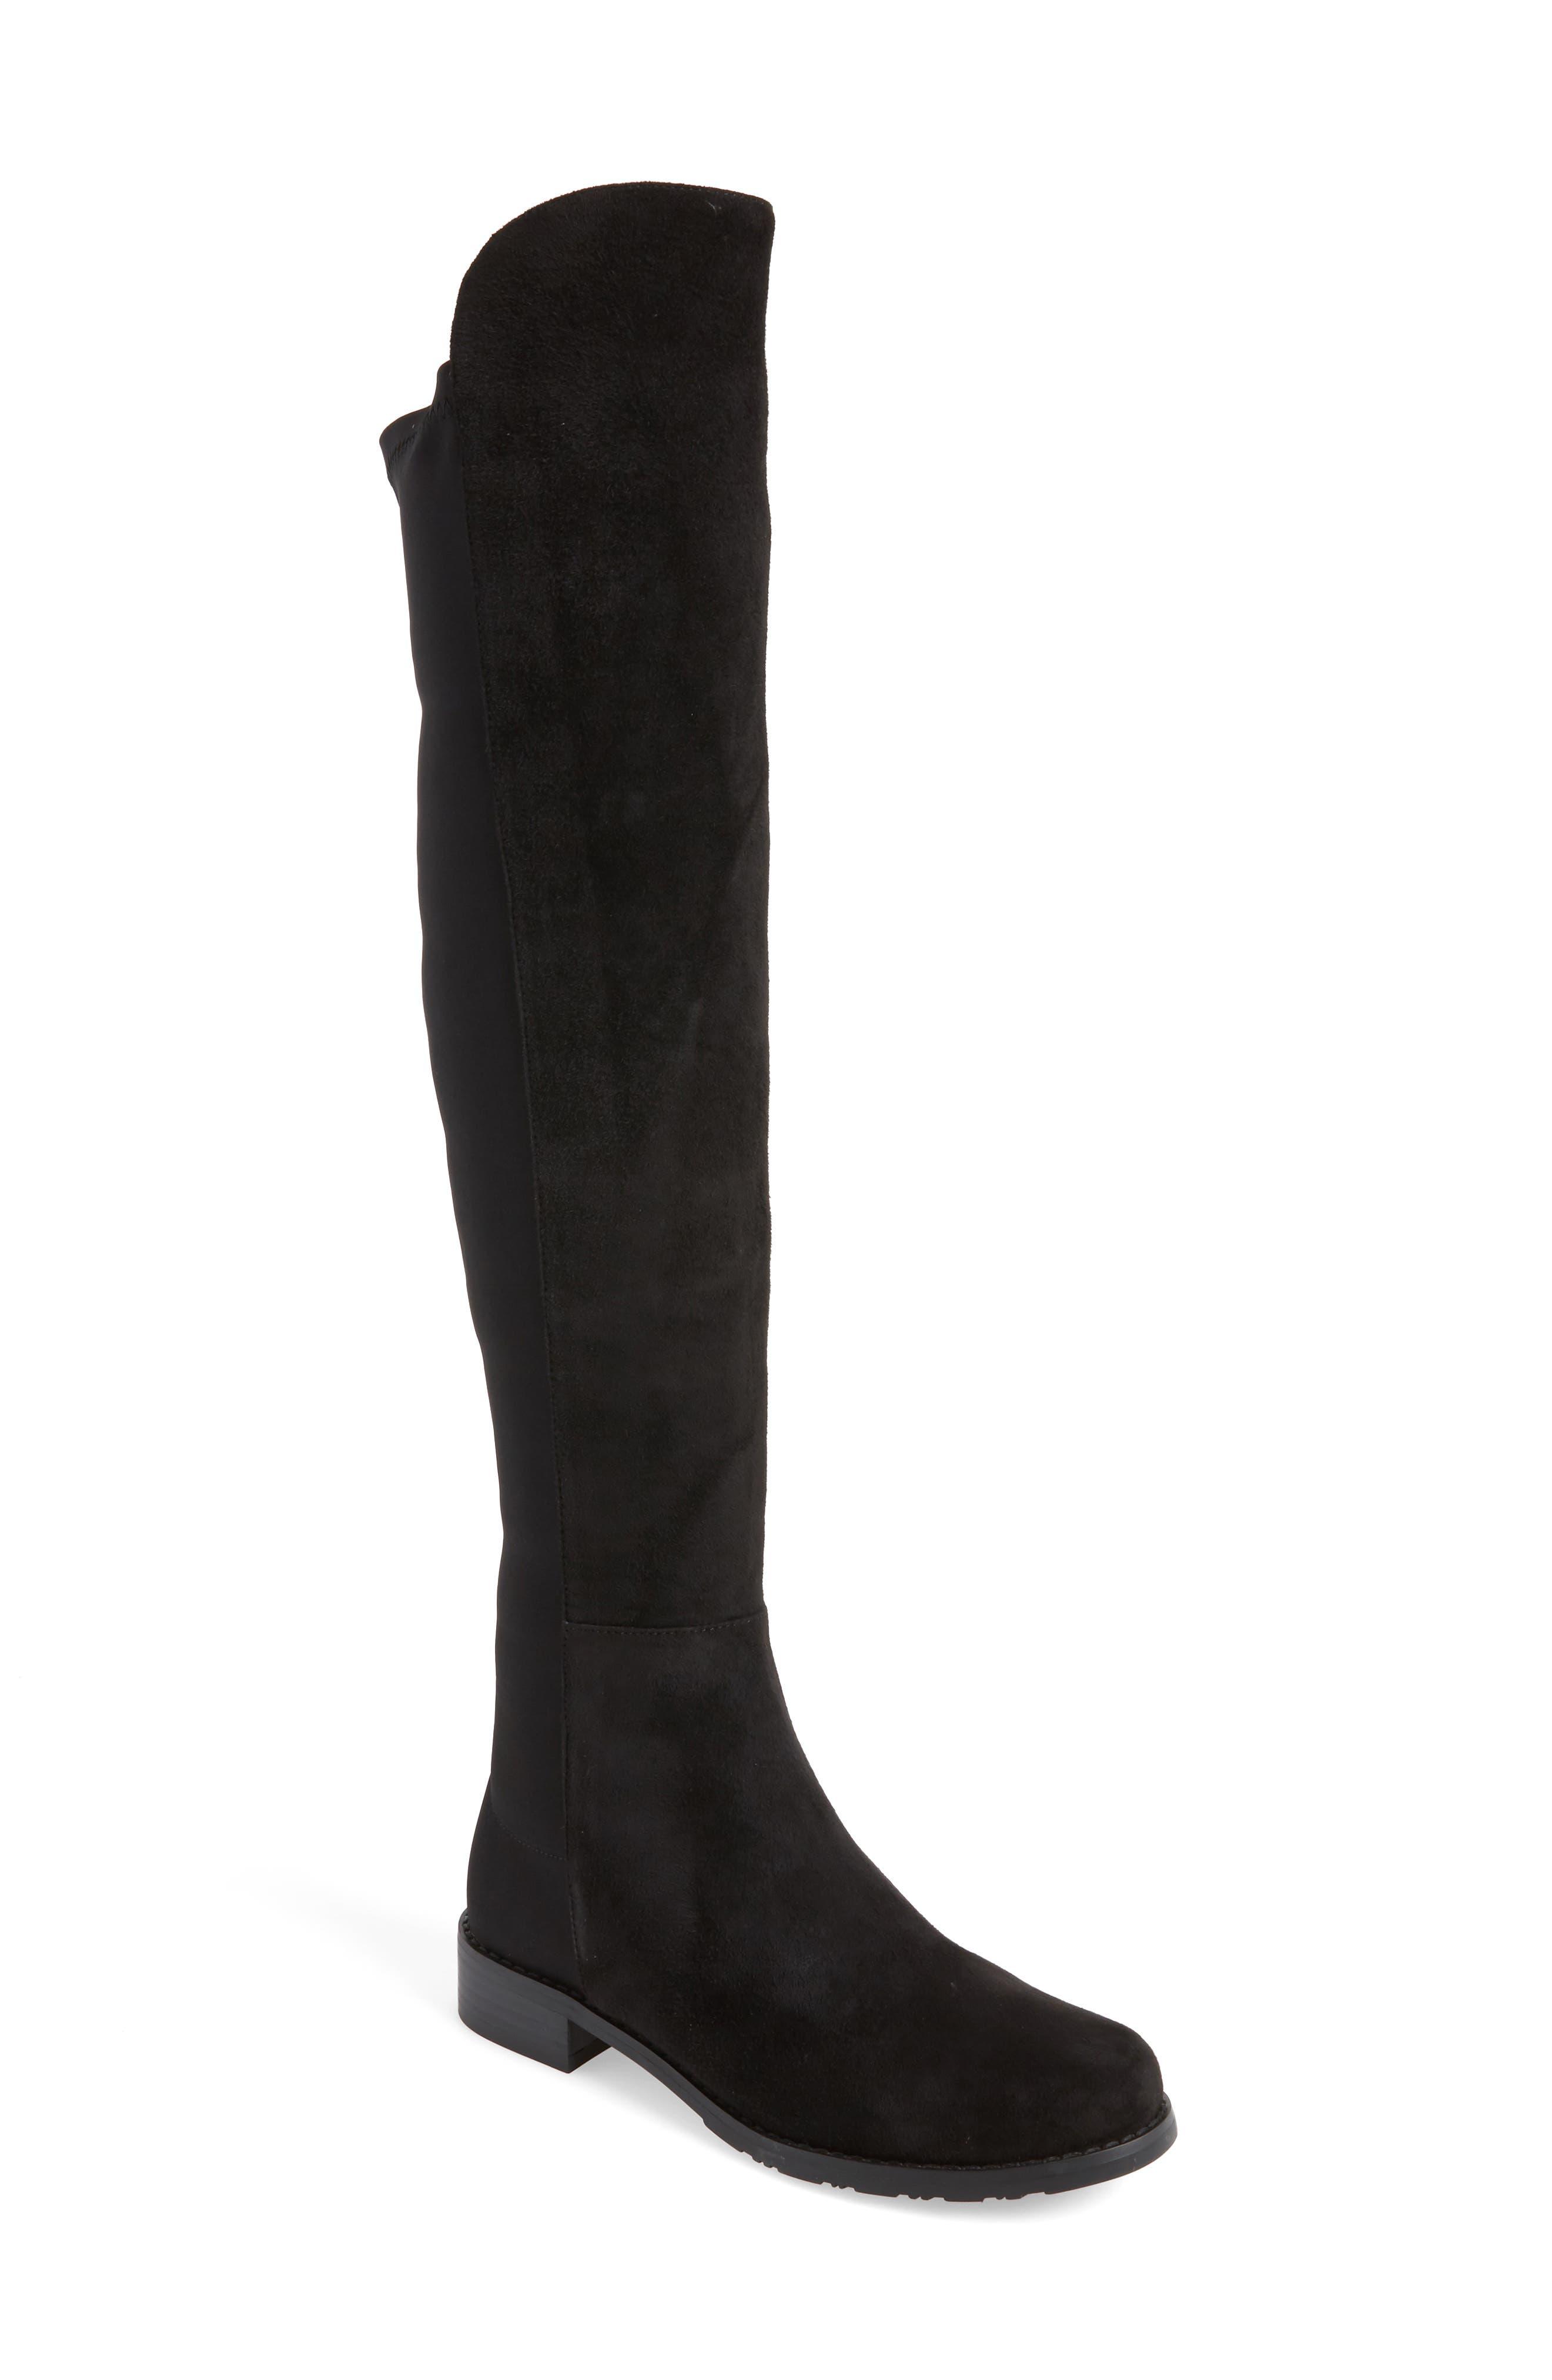 Panache Tall Boot,                         Main,                         color, 002